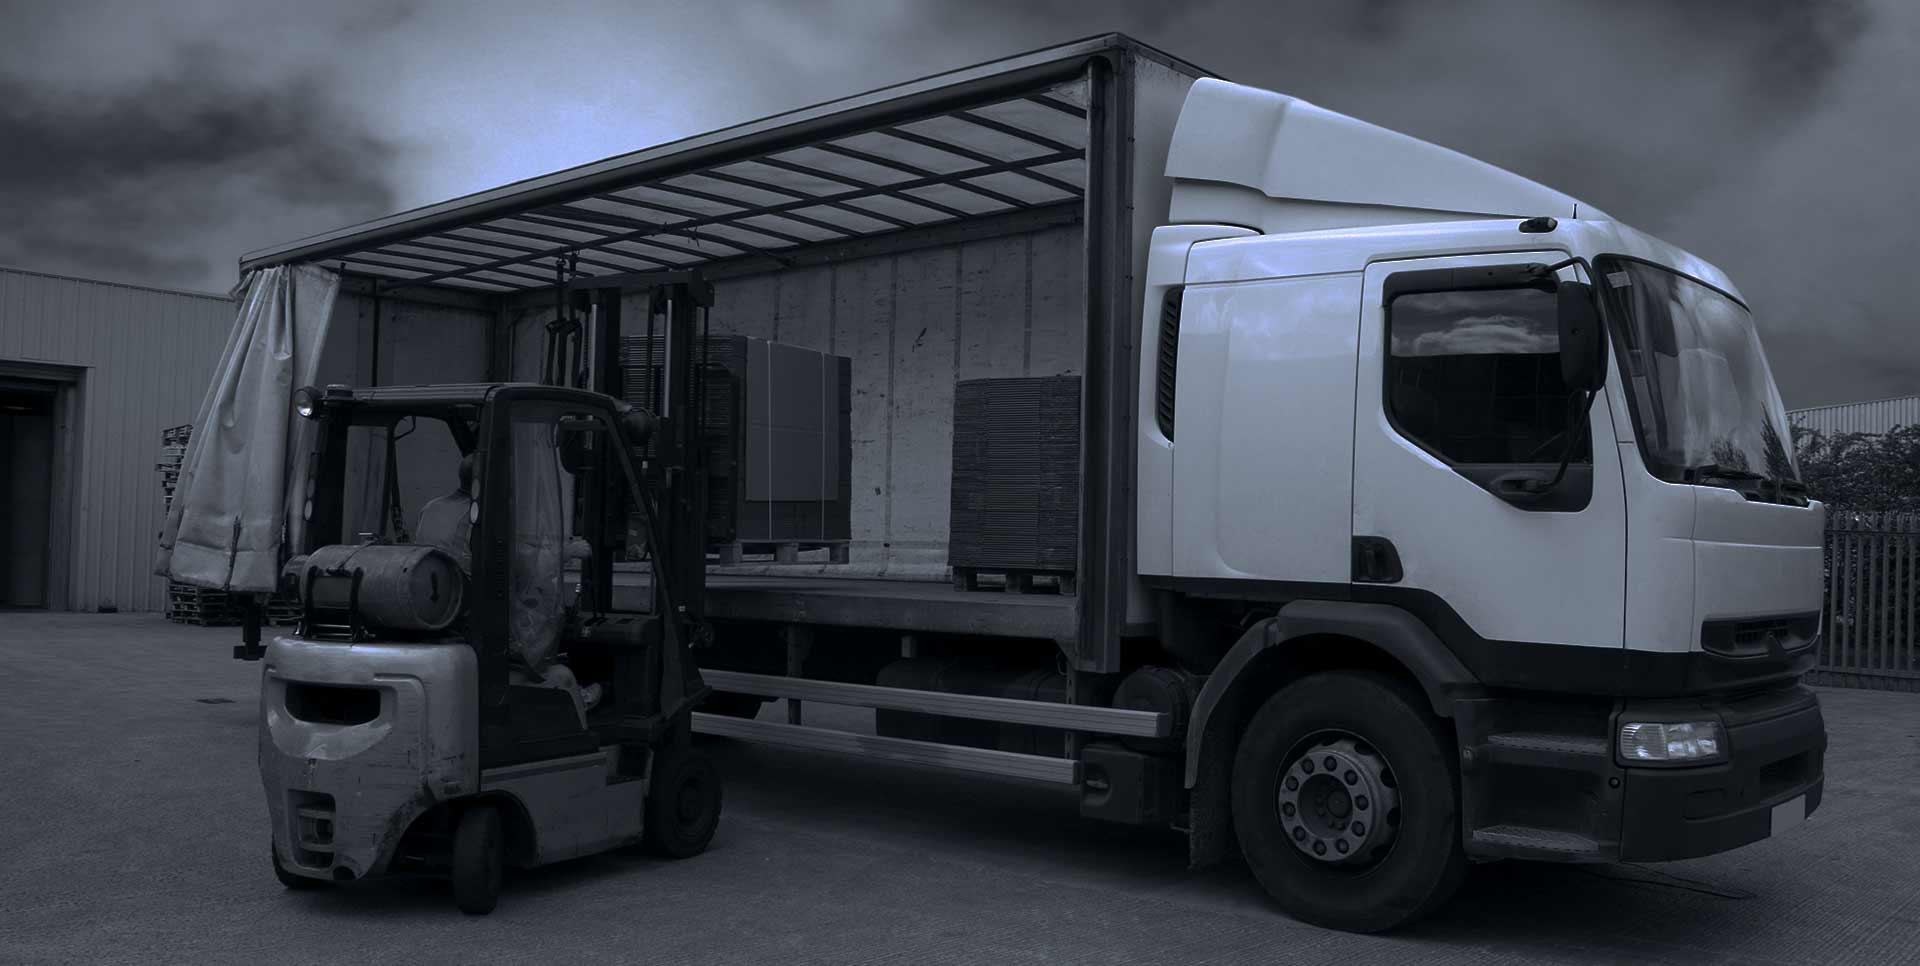 Freight Forwarders | Freight Forwarding Companies - Shiply